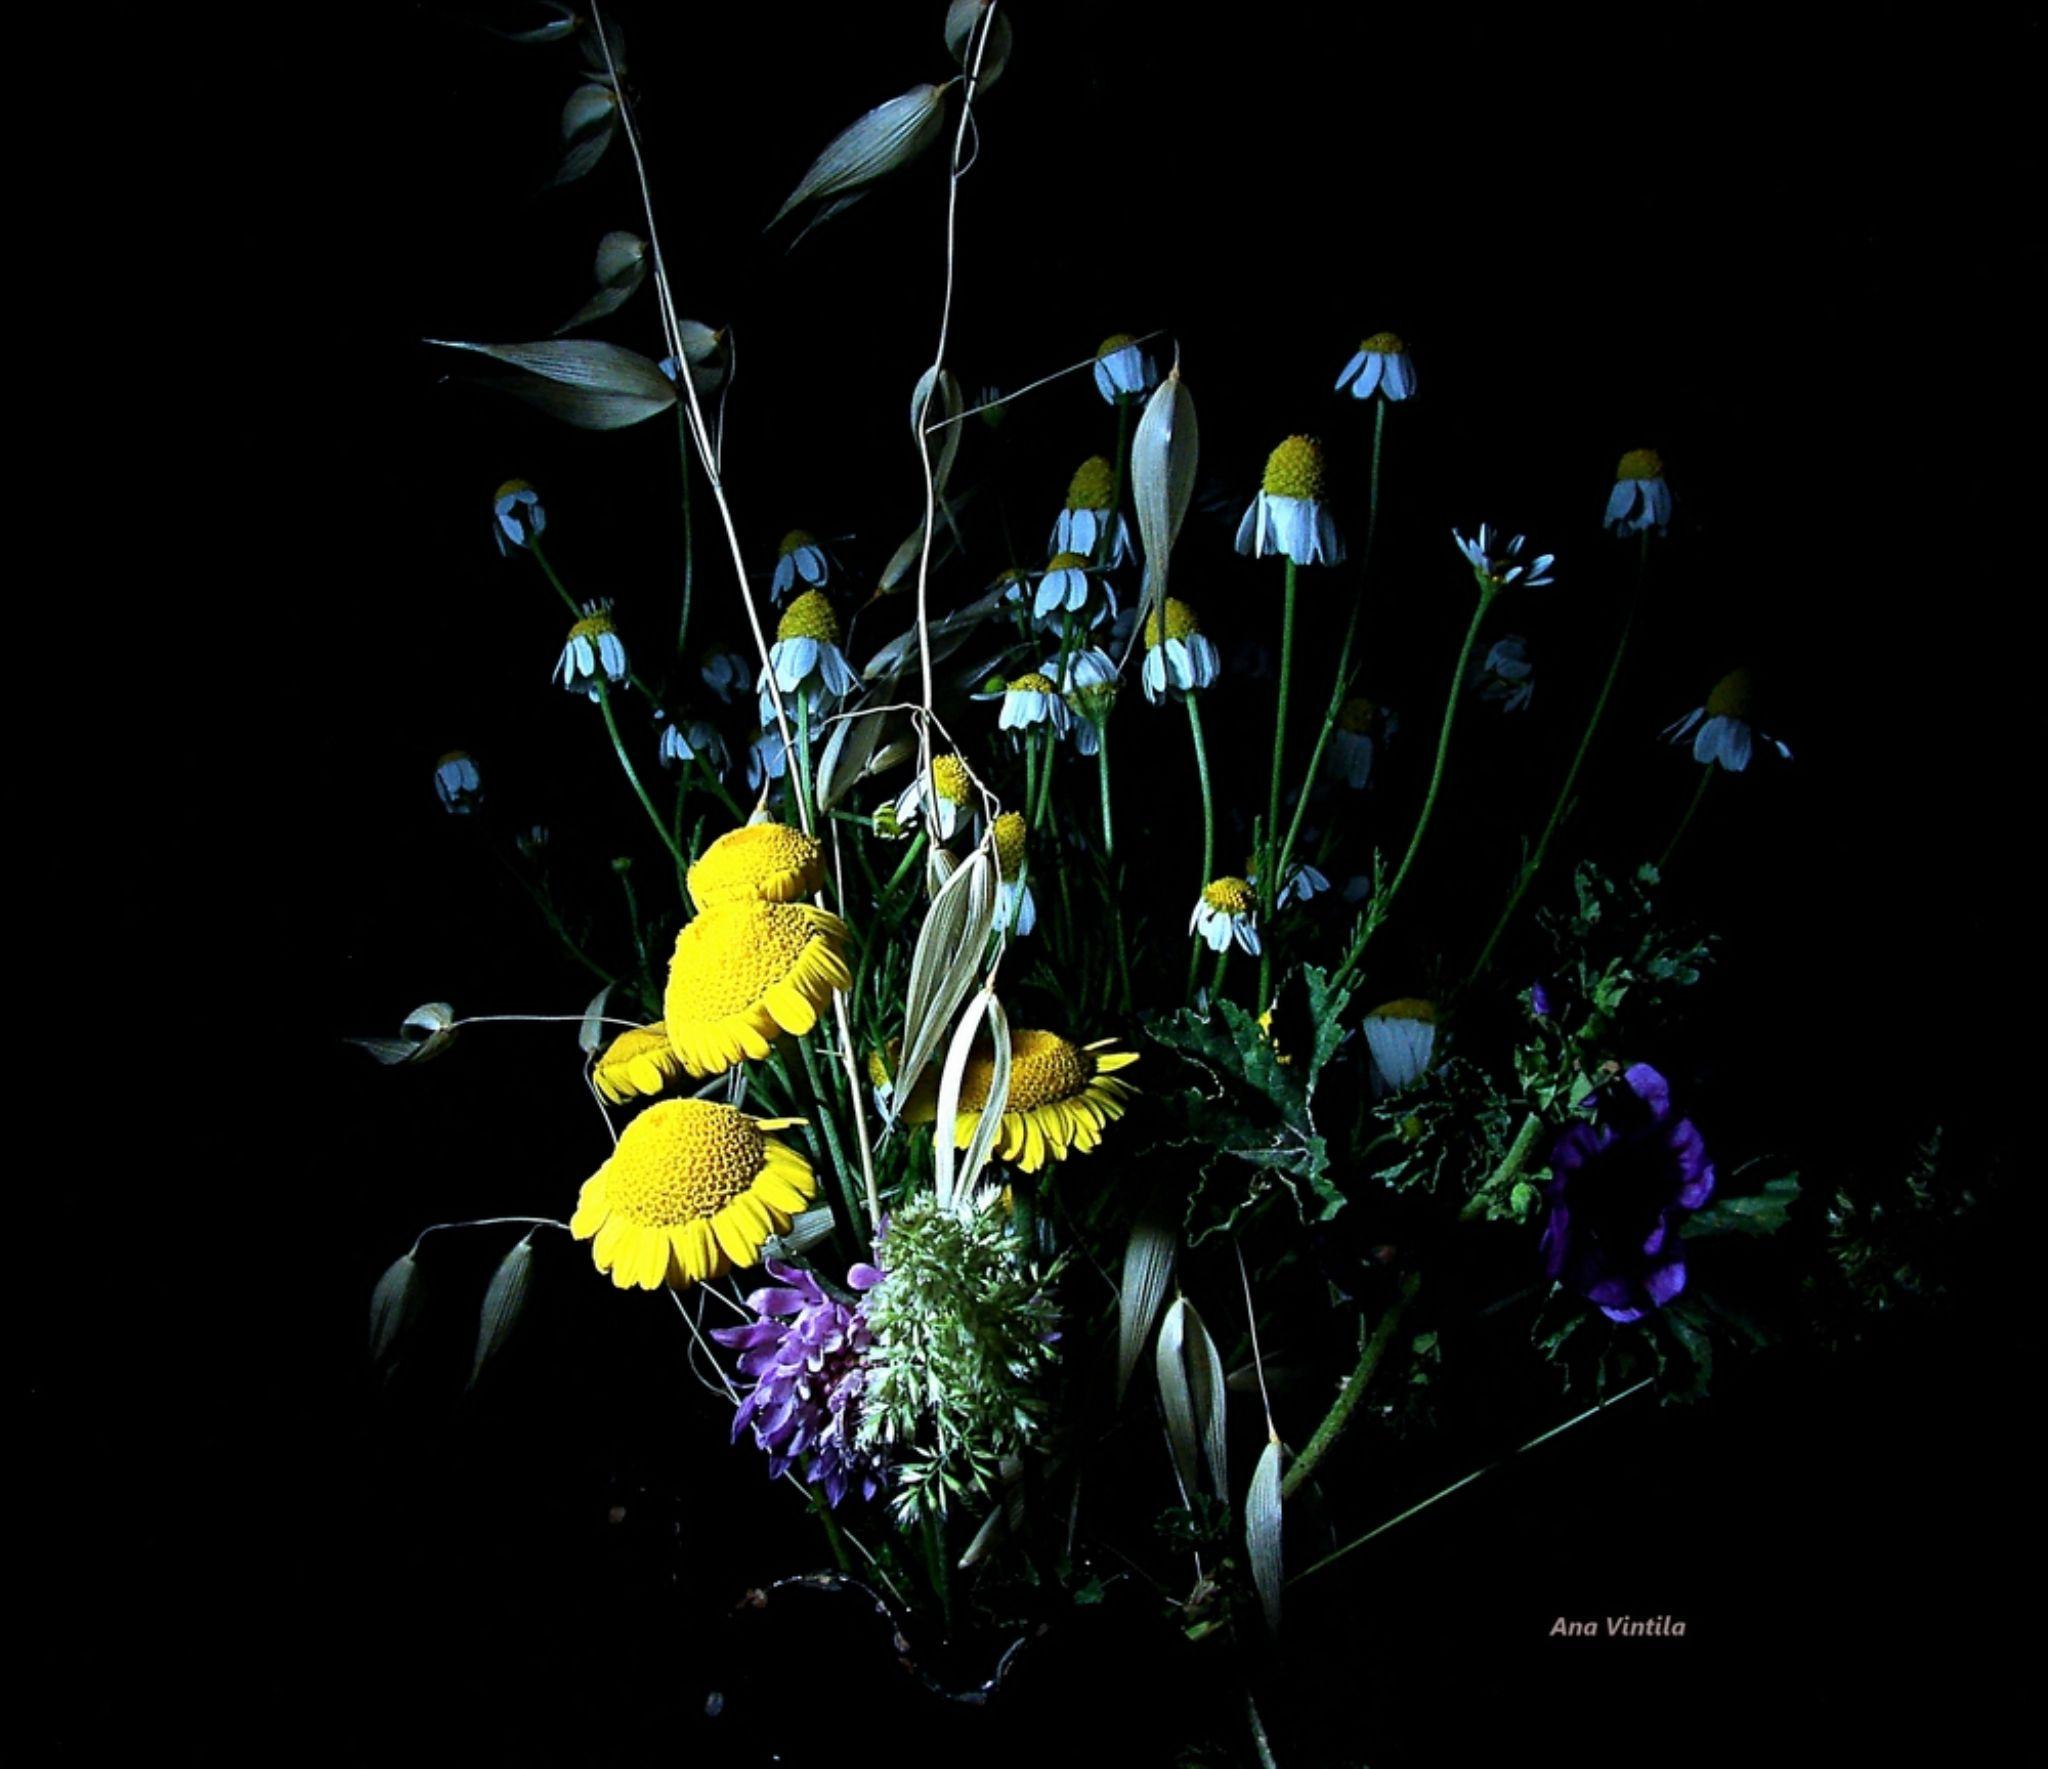 Wildflowers by vintilaana (Anny V. Art photography)